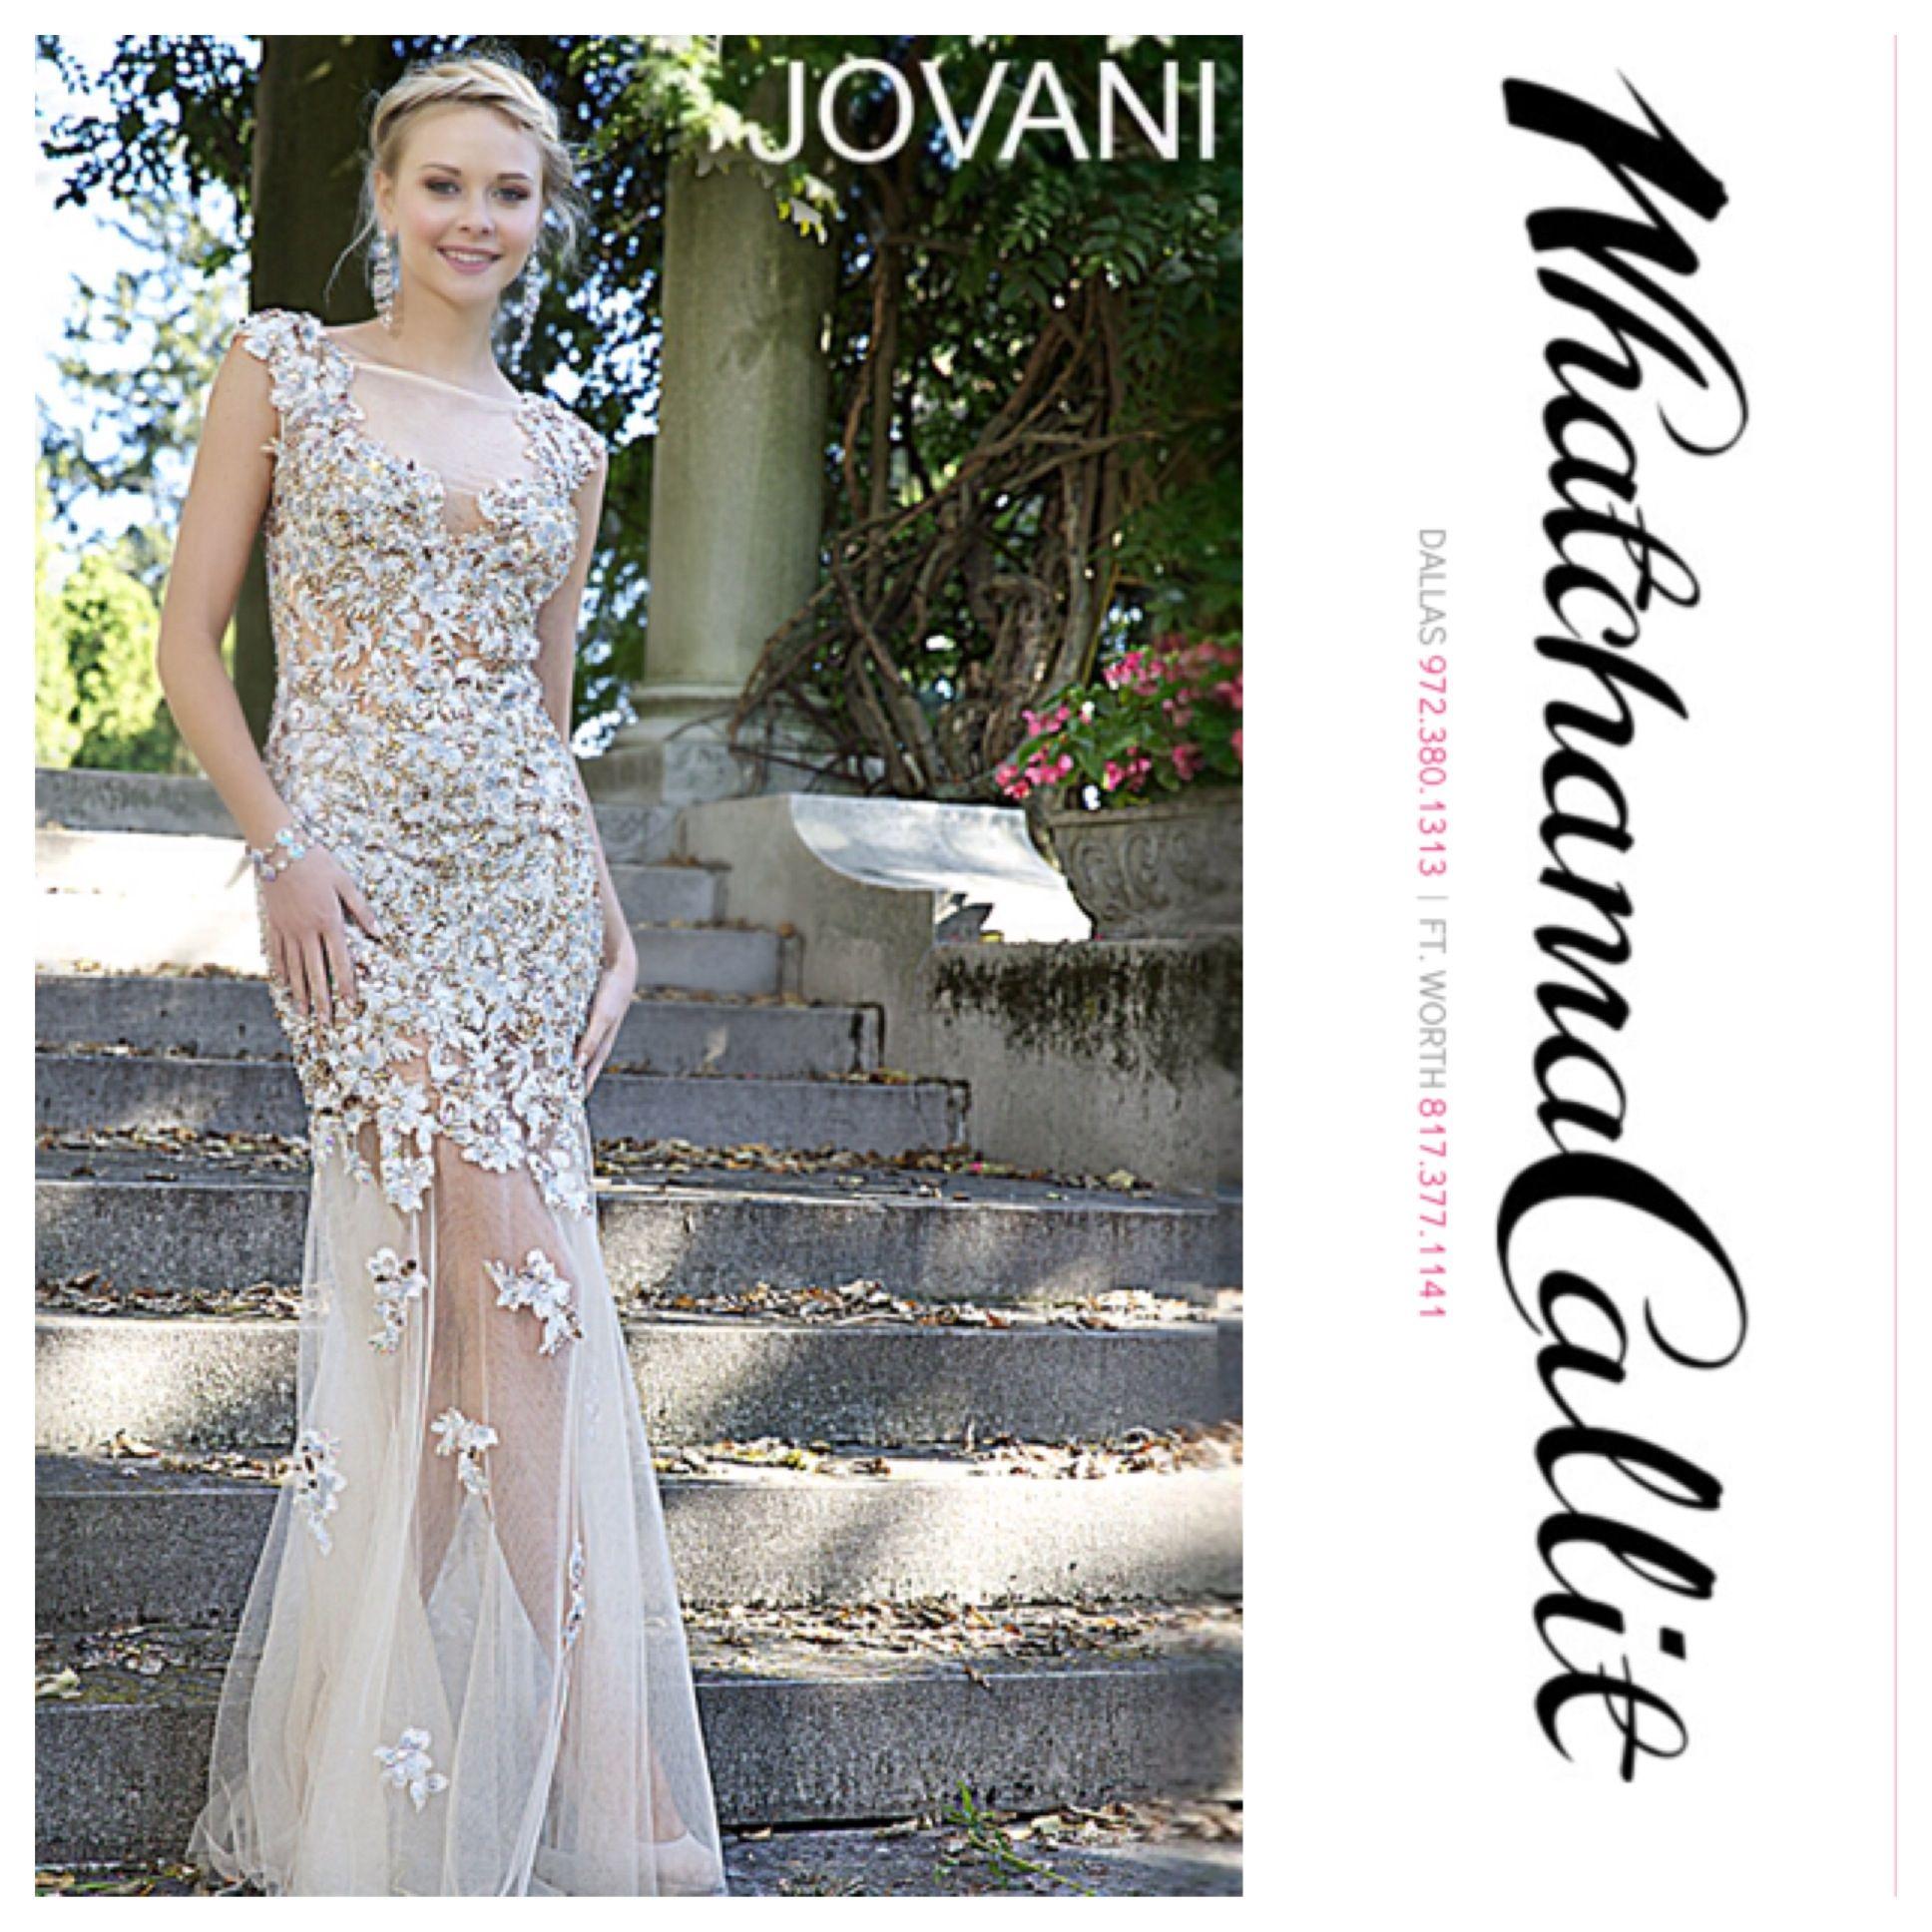 Jovani Prom Dress at Whatchamacallit Boutique #promdress #jovani ...